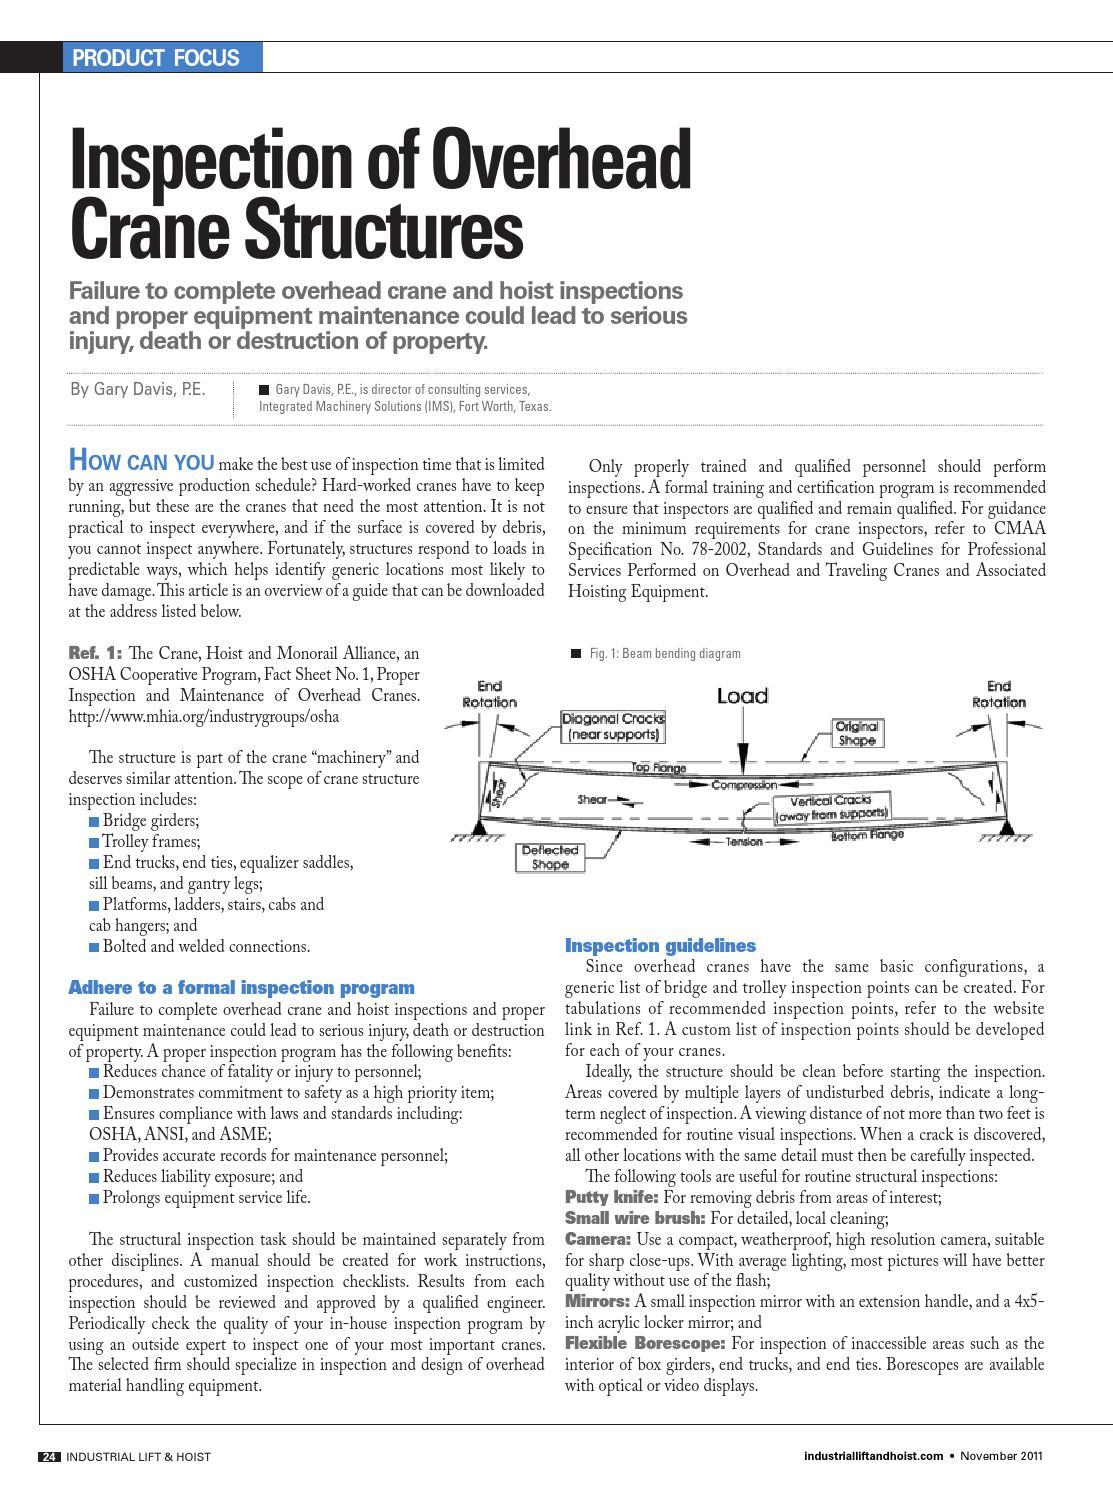 Ilh structural inspection of overhead cranes (gary j davis